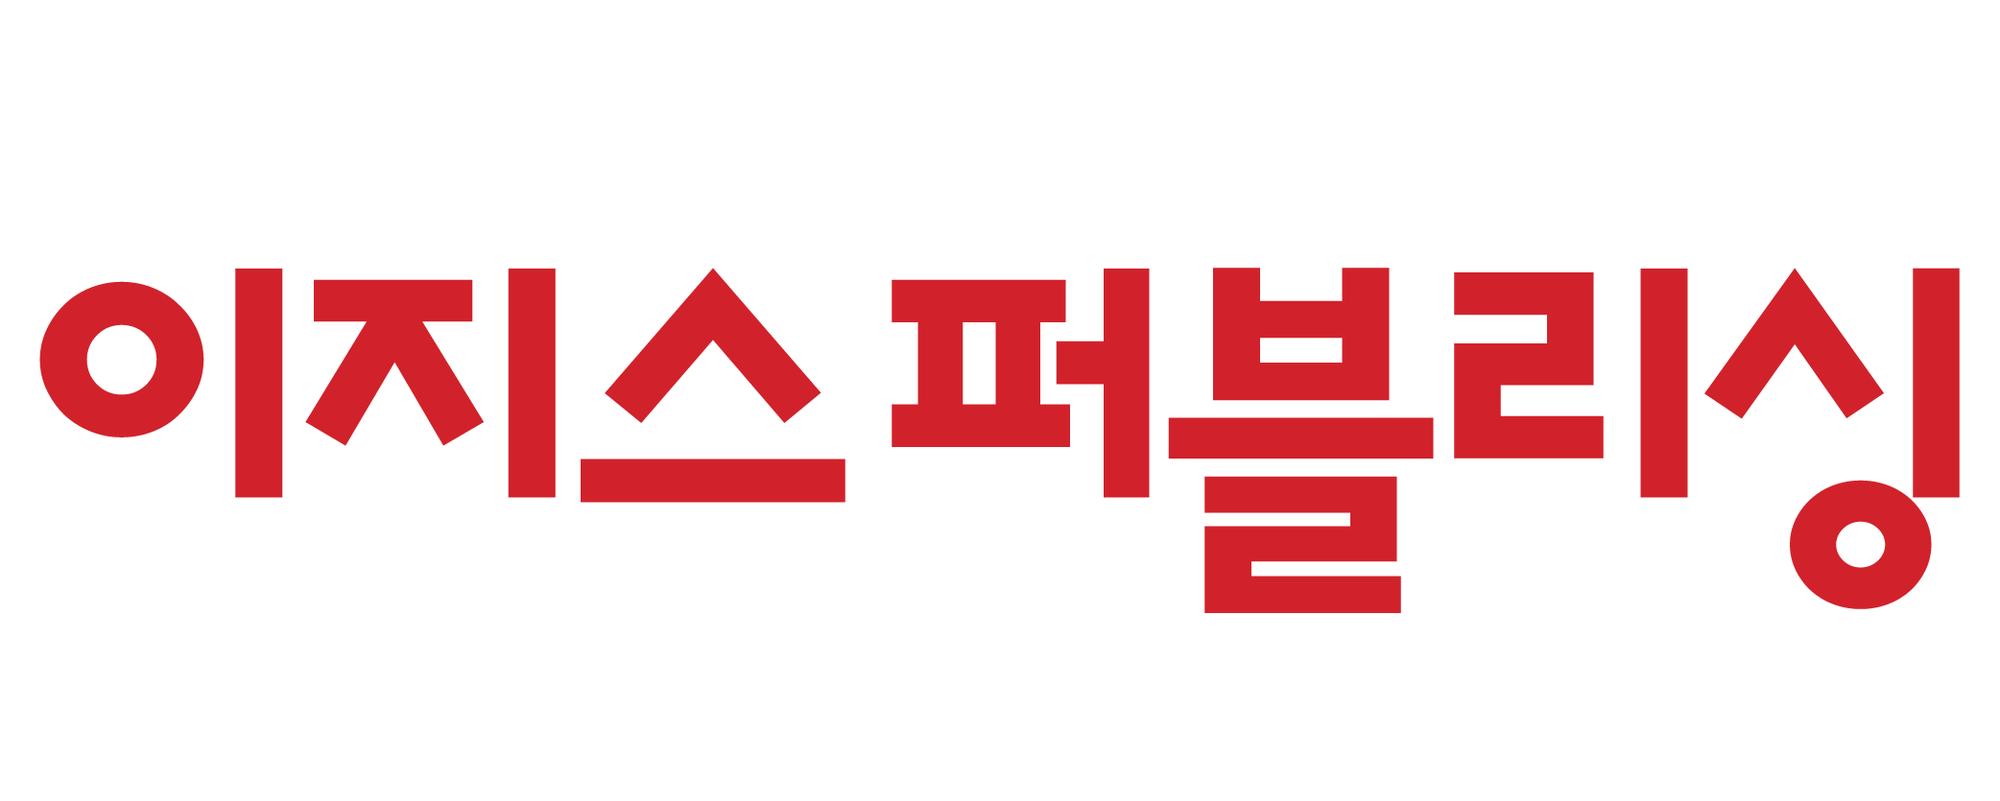 UPF_Sponsor_logo_amass___copy_3.png